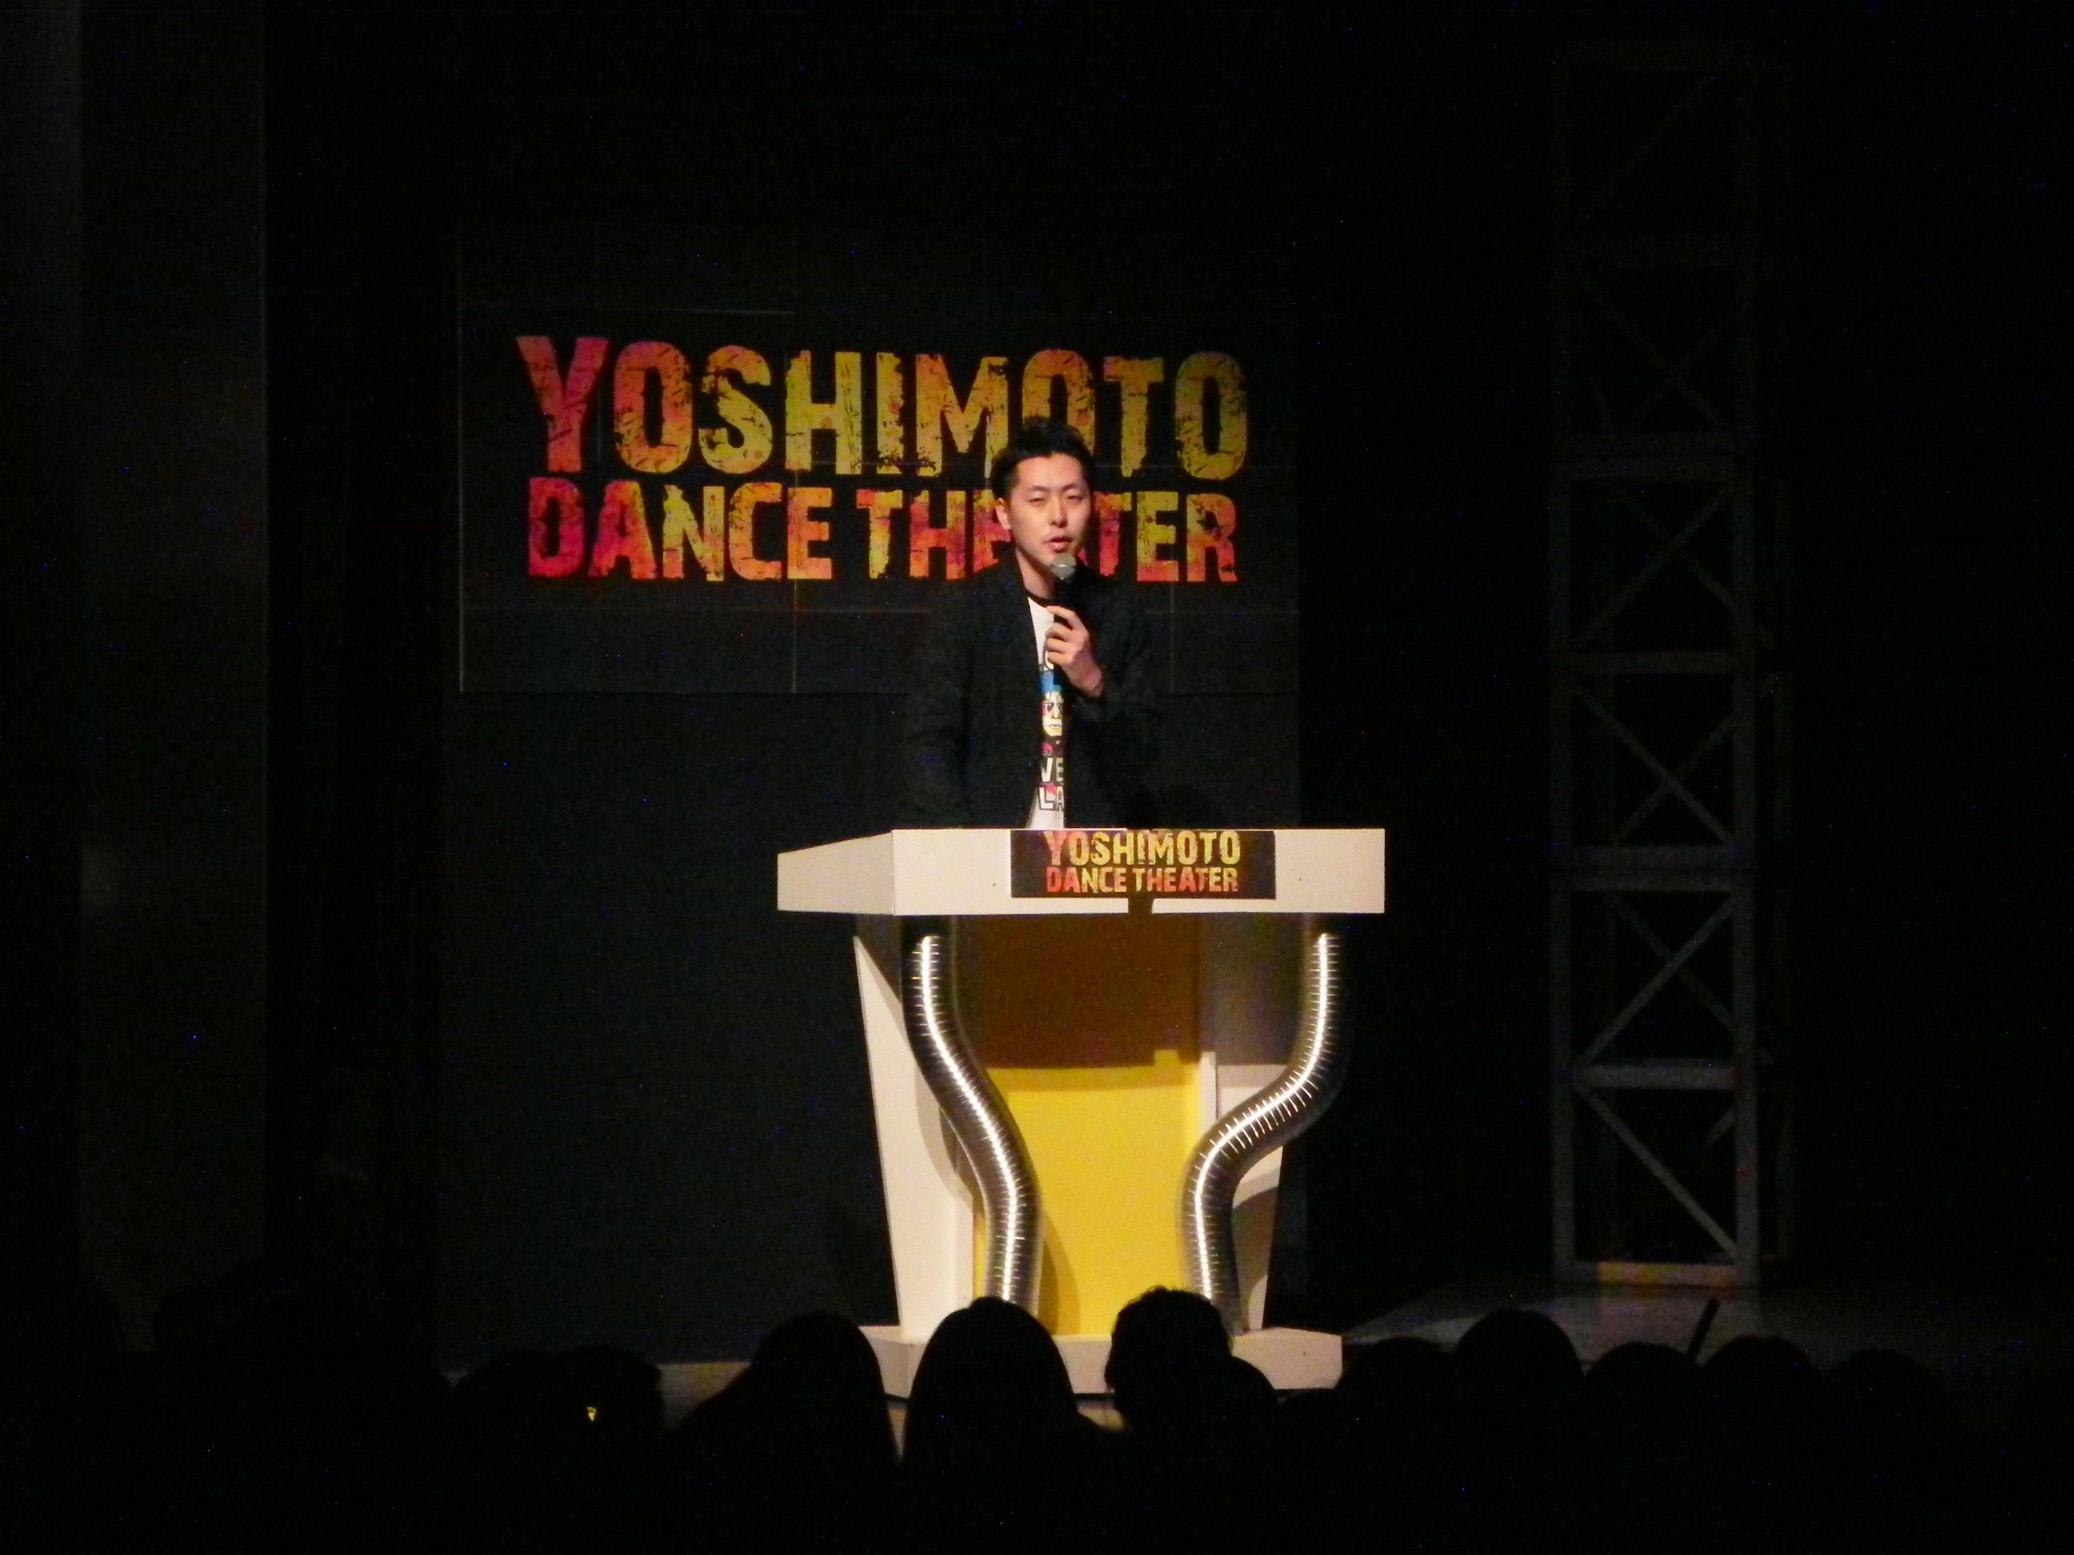 http://news.yoshimoto.co.jp/20170507154006-8d5305f36eed86fb8eb402443d04428561a7a287.jpg